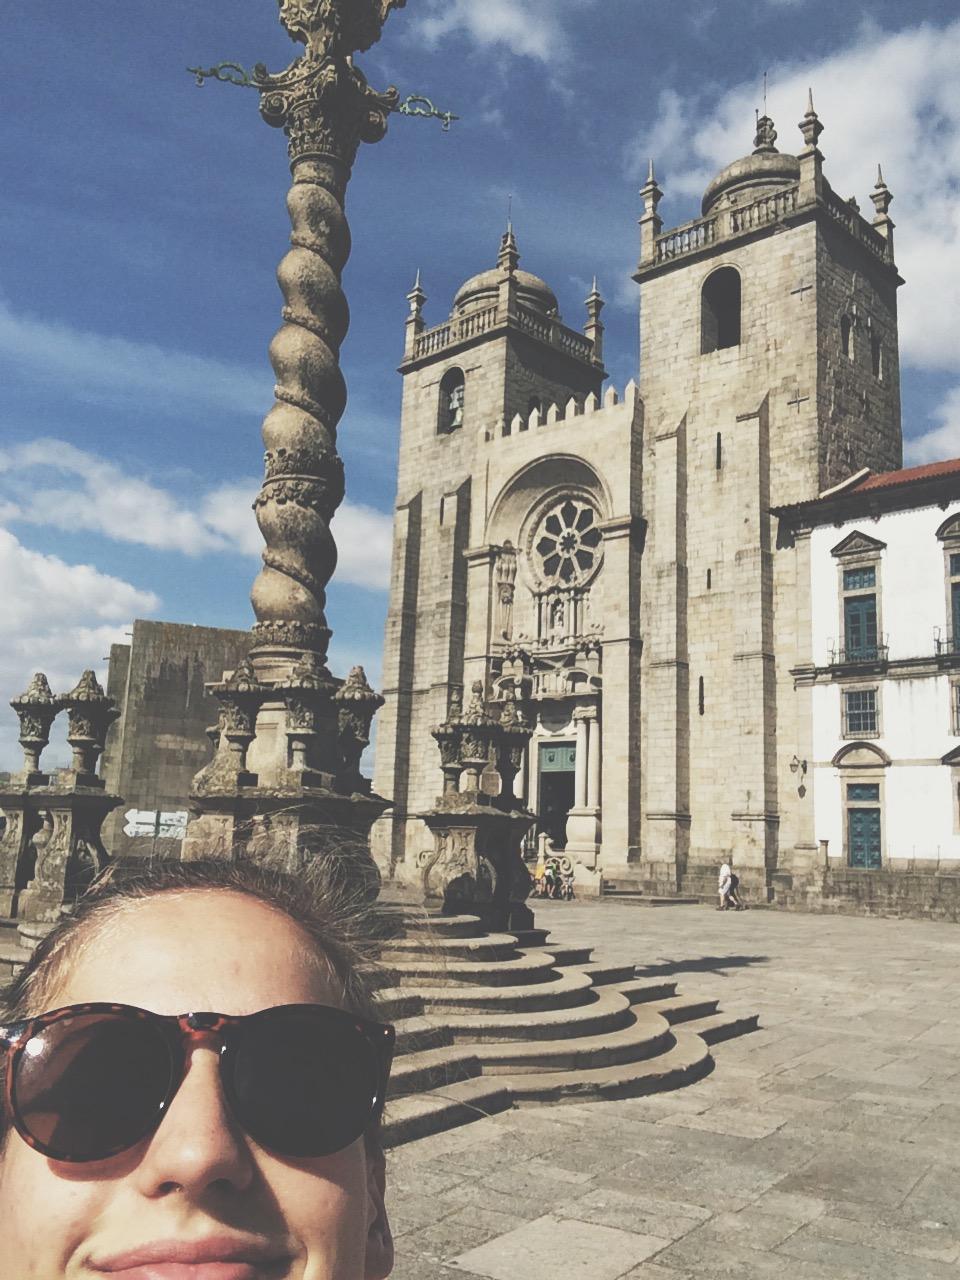 cathedralporto.JPG